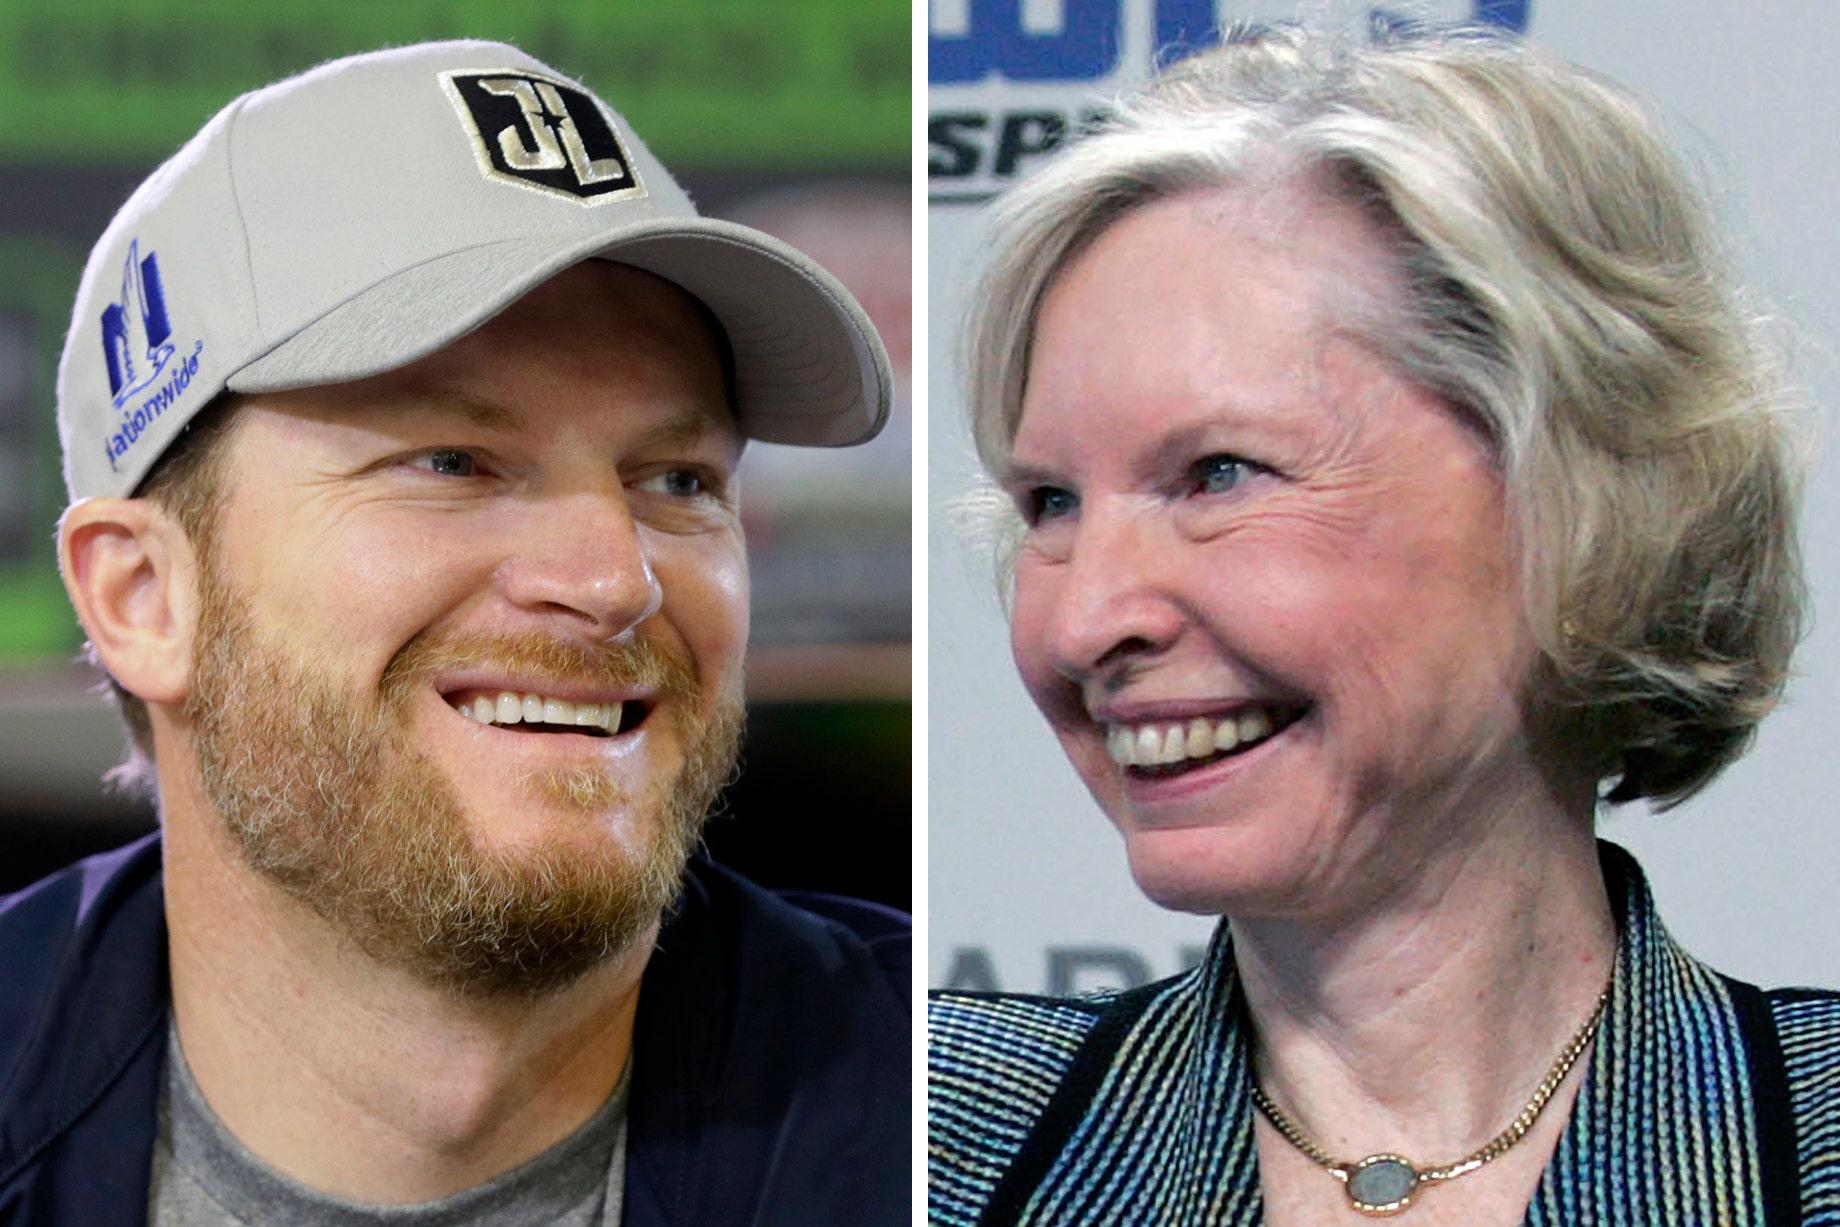 Dale Jr., Janet Guthrie among 2020 NASCAR Hall of Fame nominees